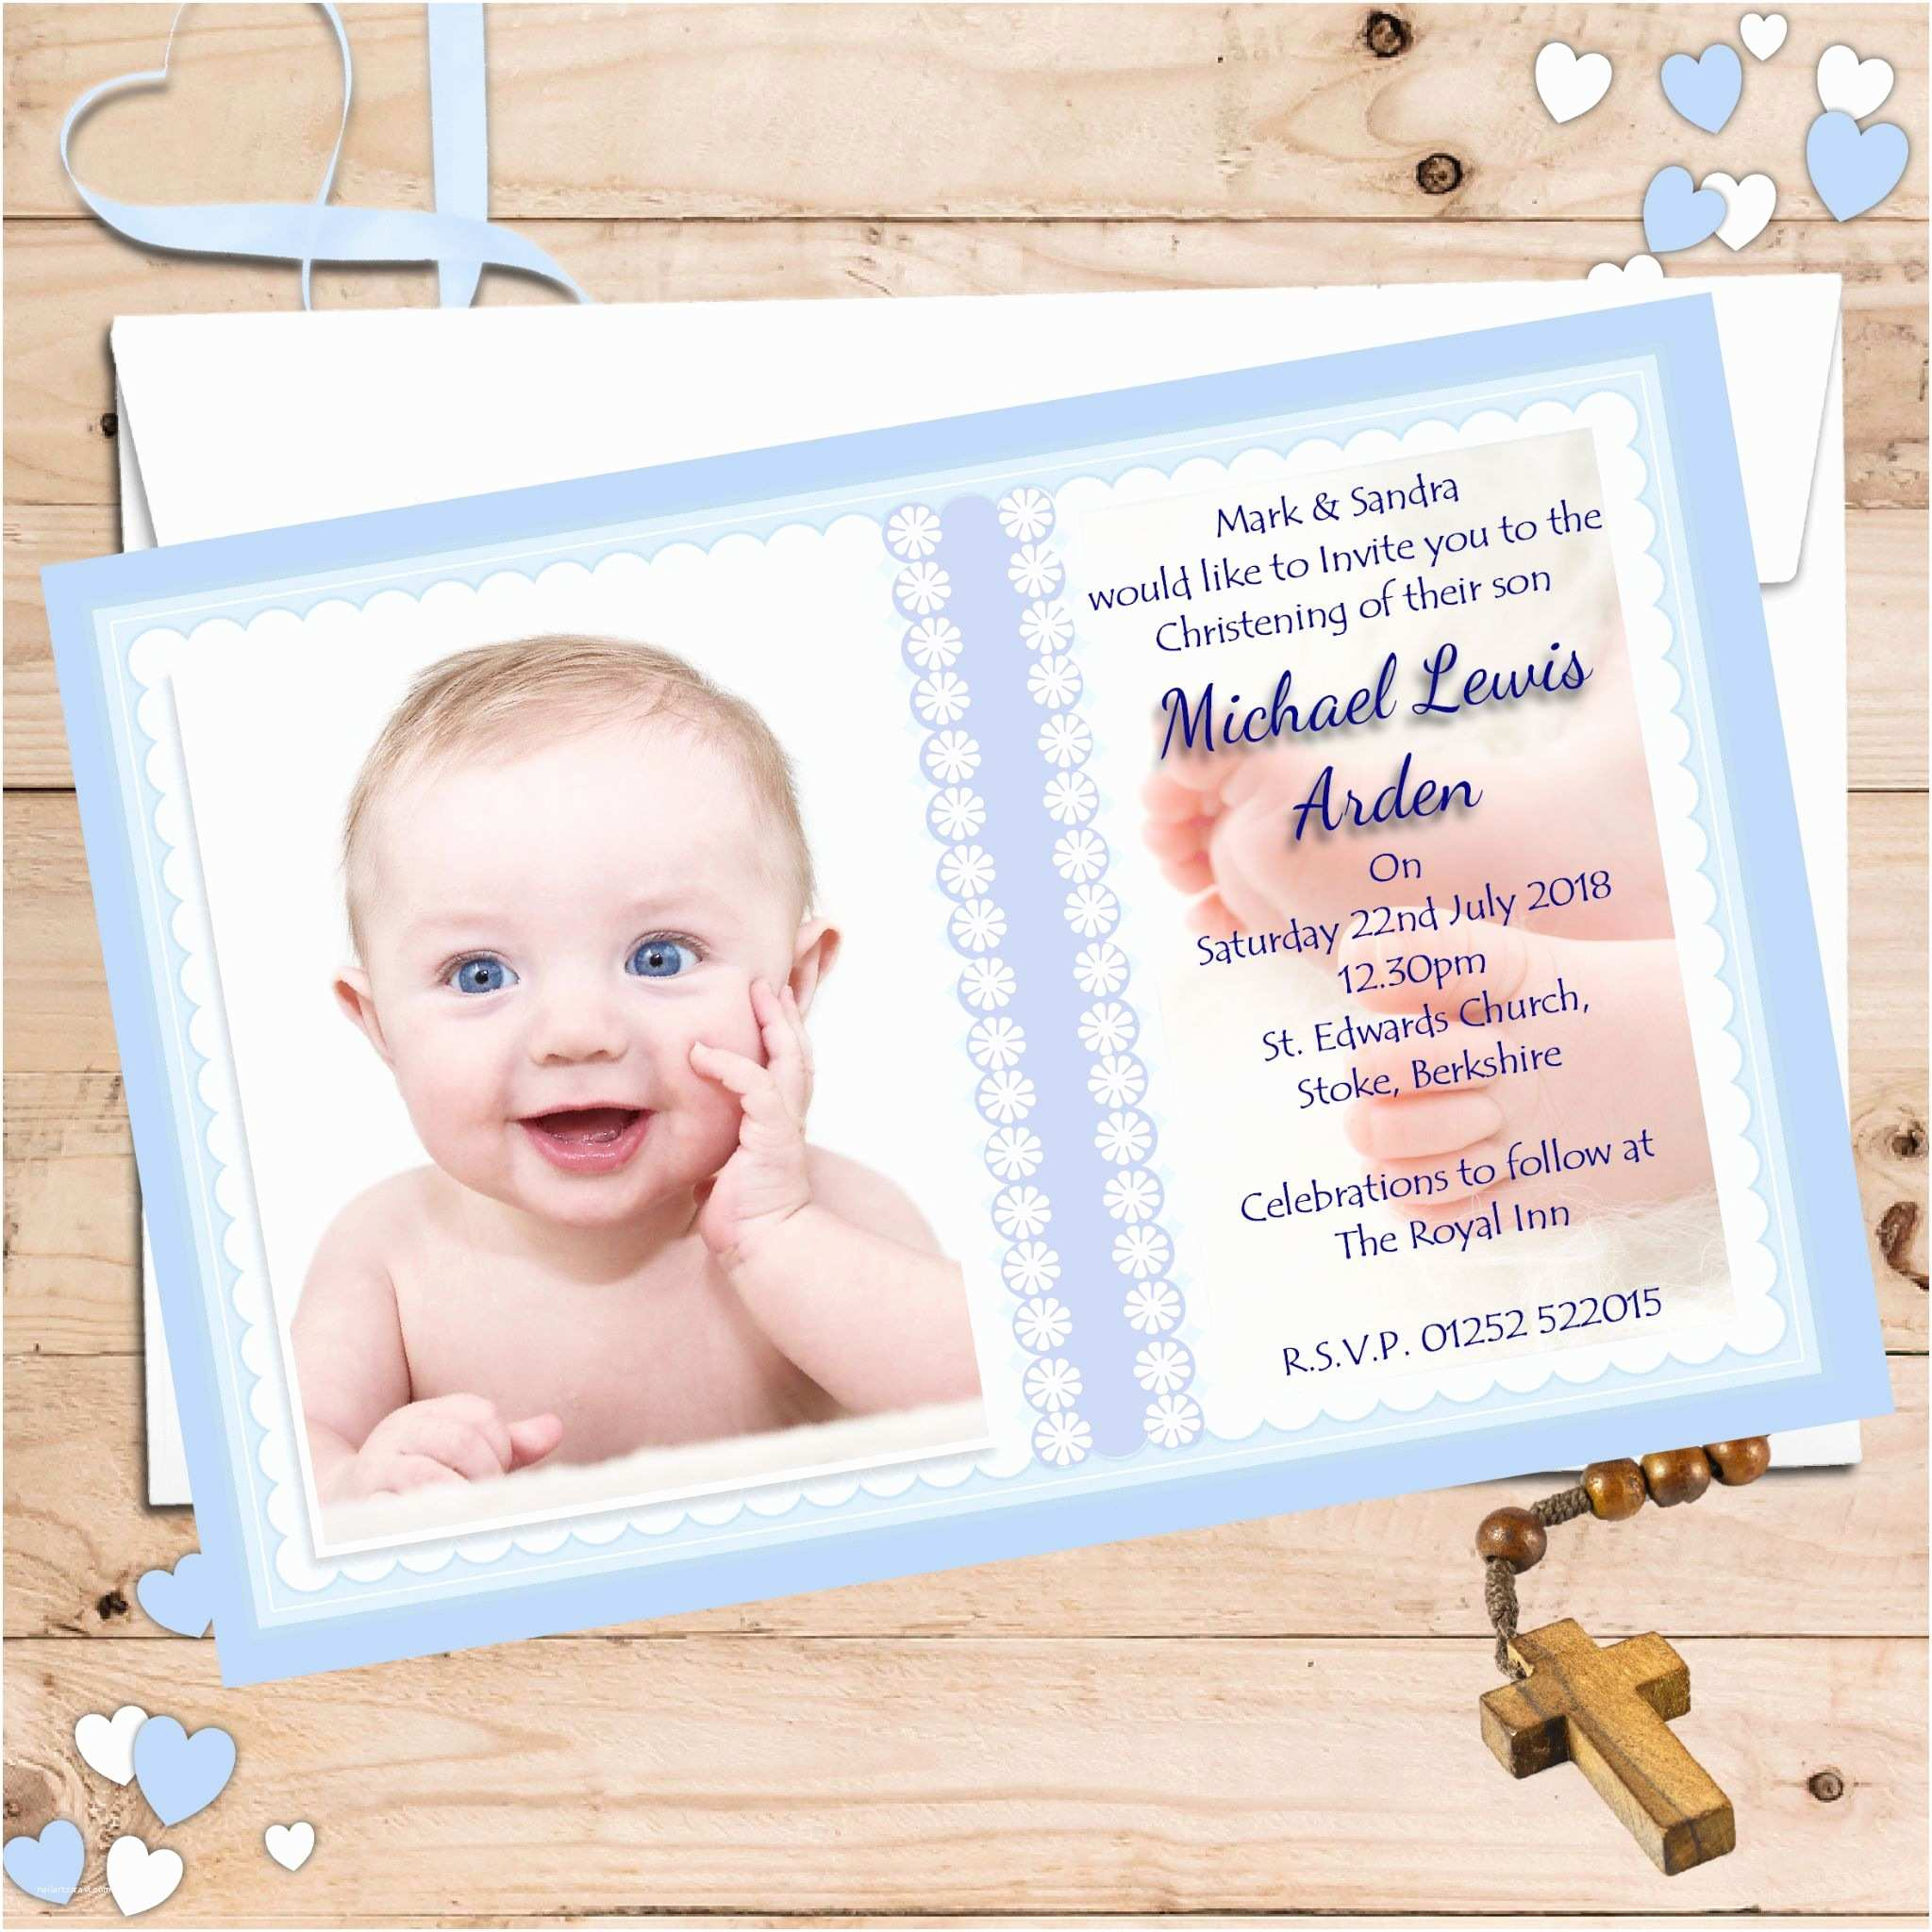 10 personalised boys christening baptism invitations photo invites n59 1819 p